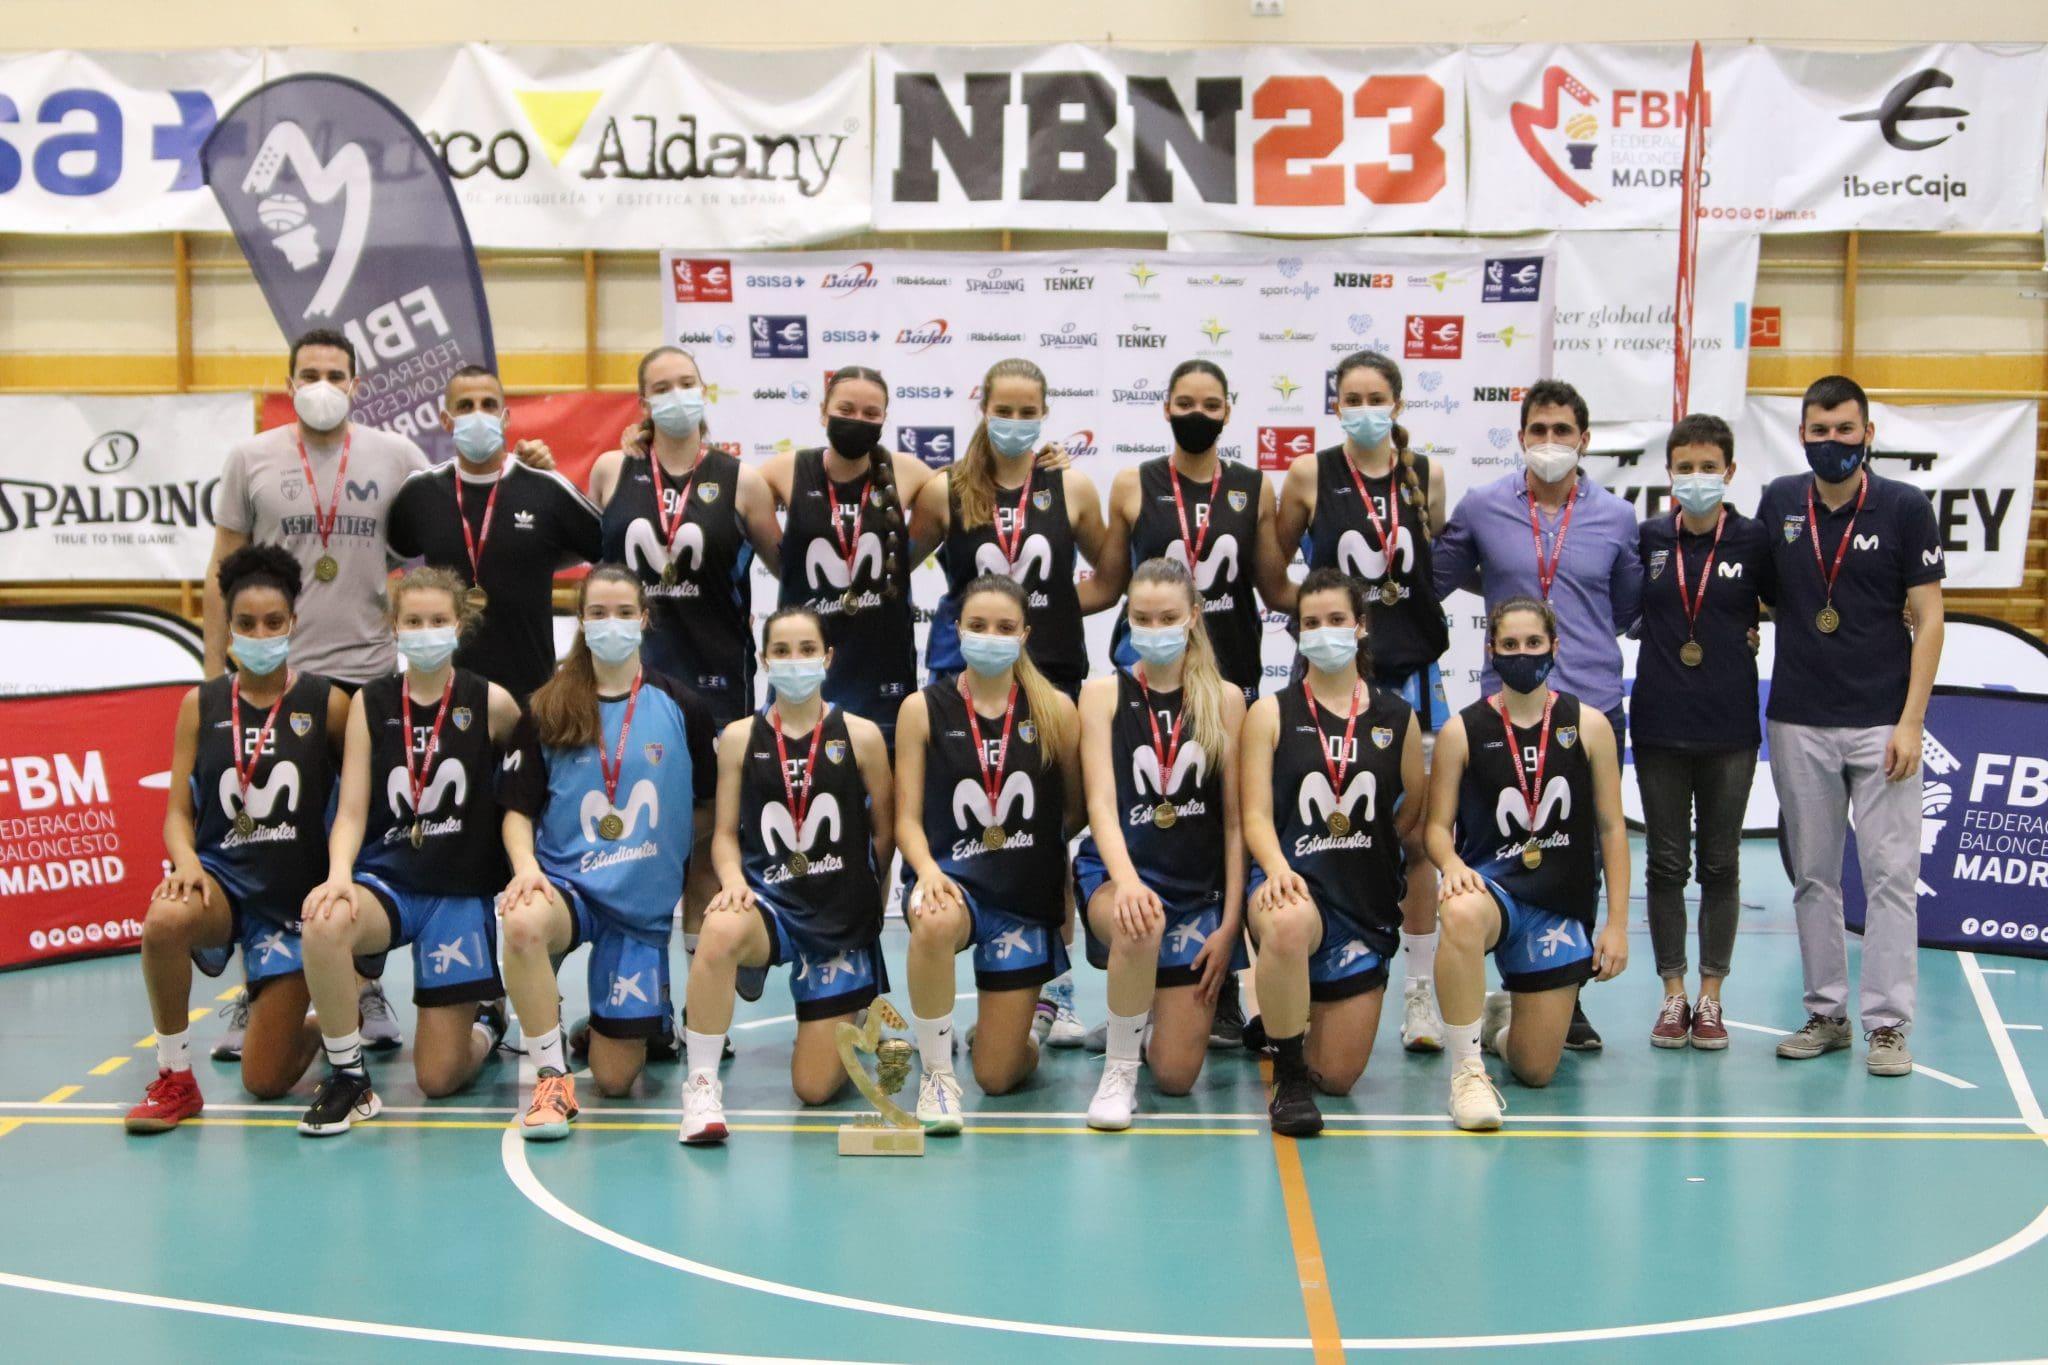 Campeonato de España Cadete Femenino (18-24 junio)